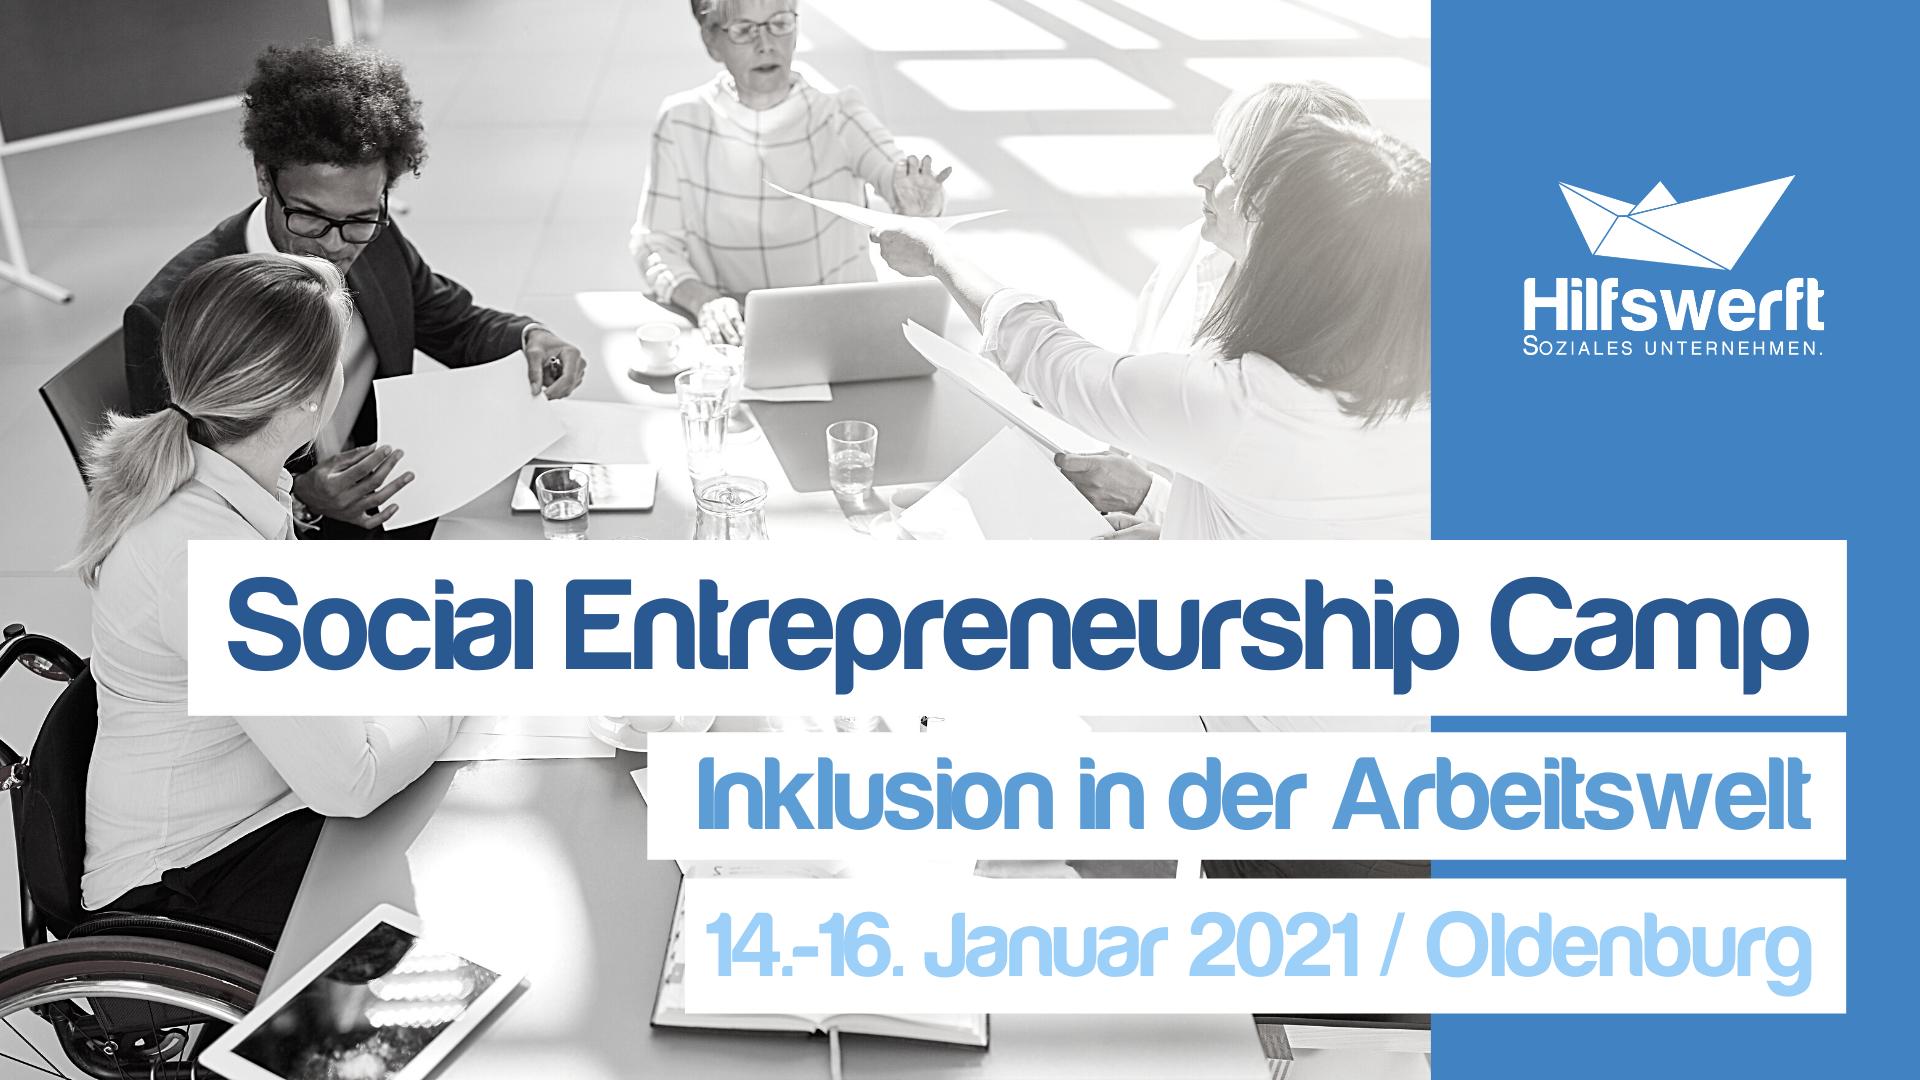 Social Entrepreneurship Camp, Inklusion in der Arbeitswelt, OLdenburg, Hilfswerft